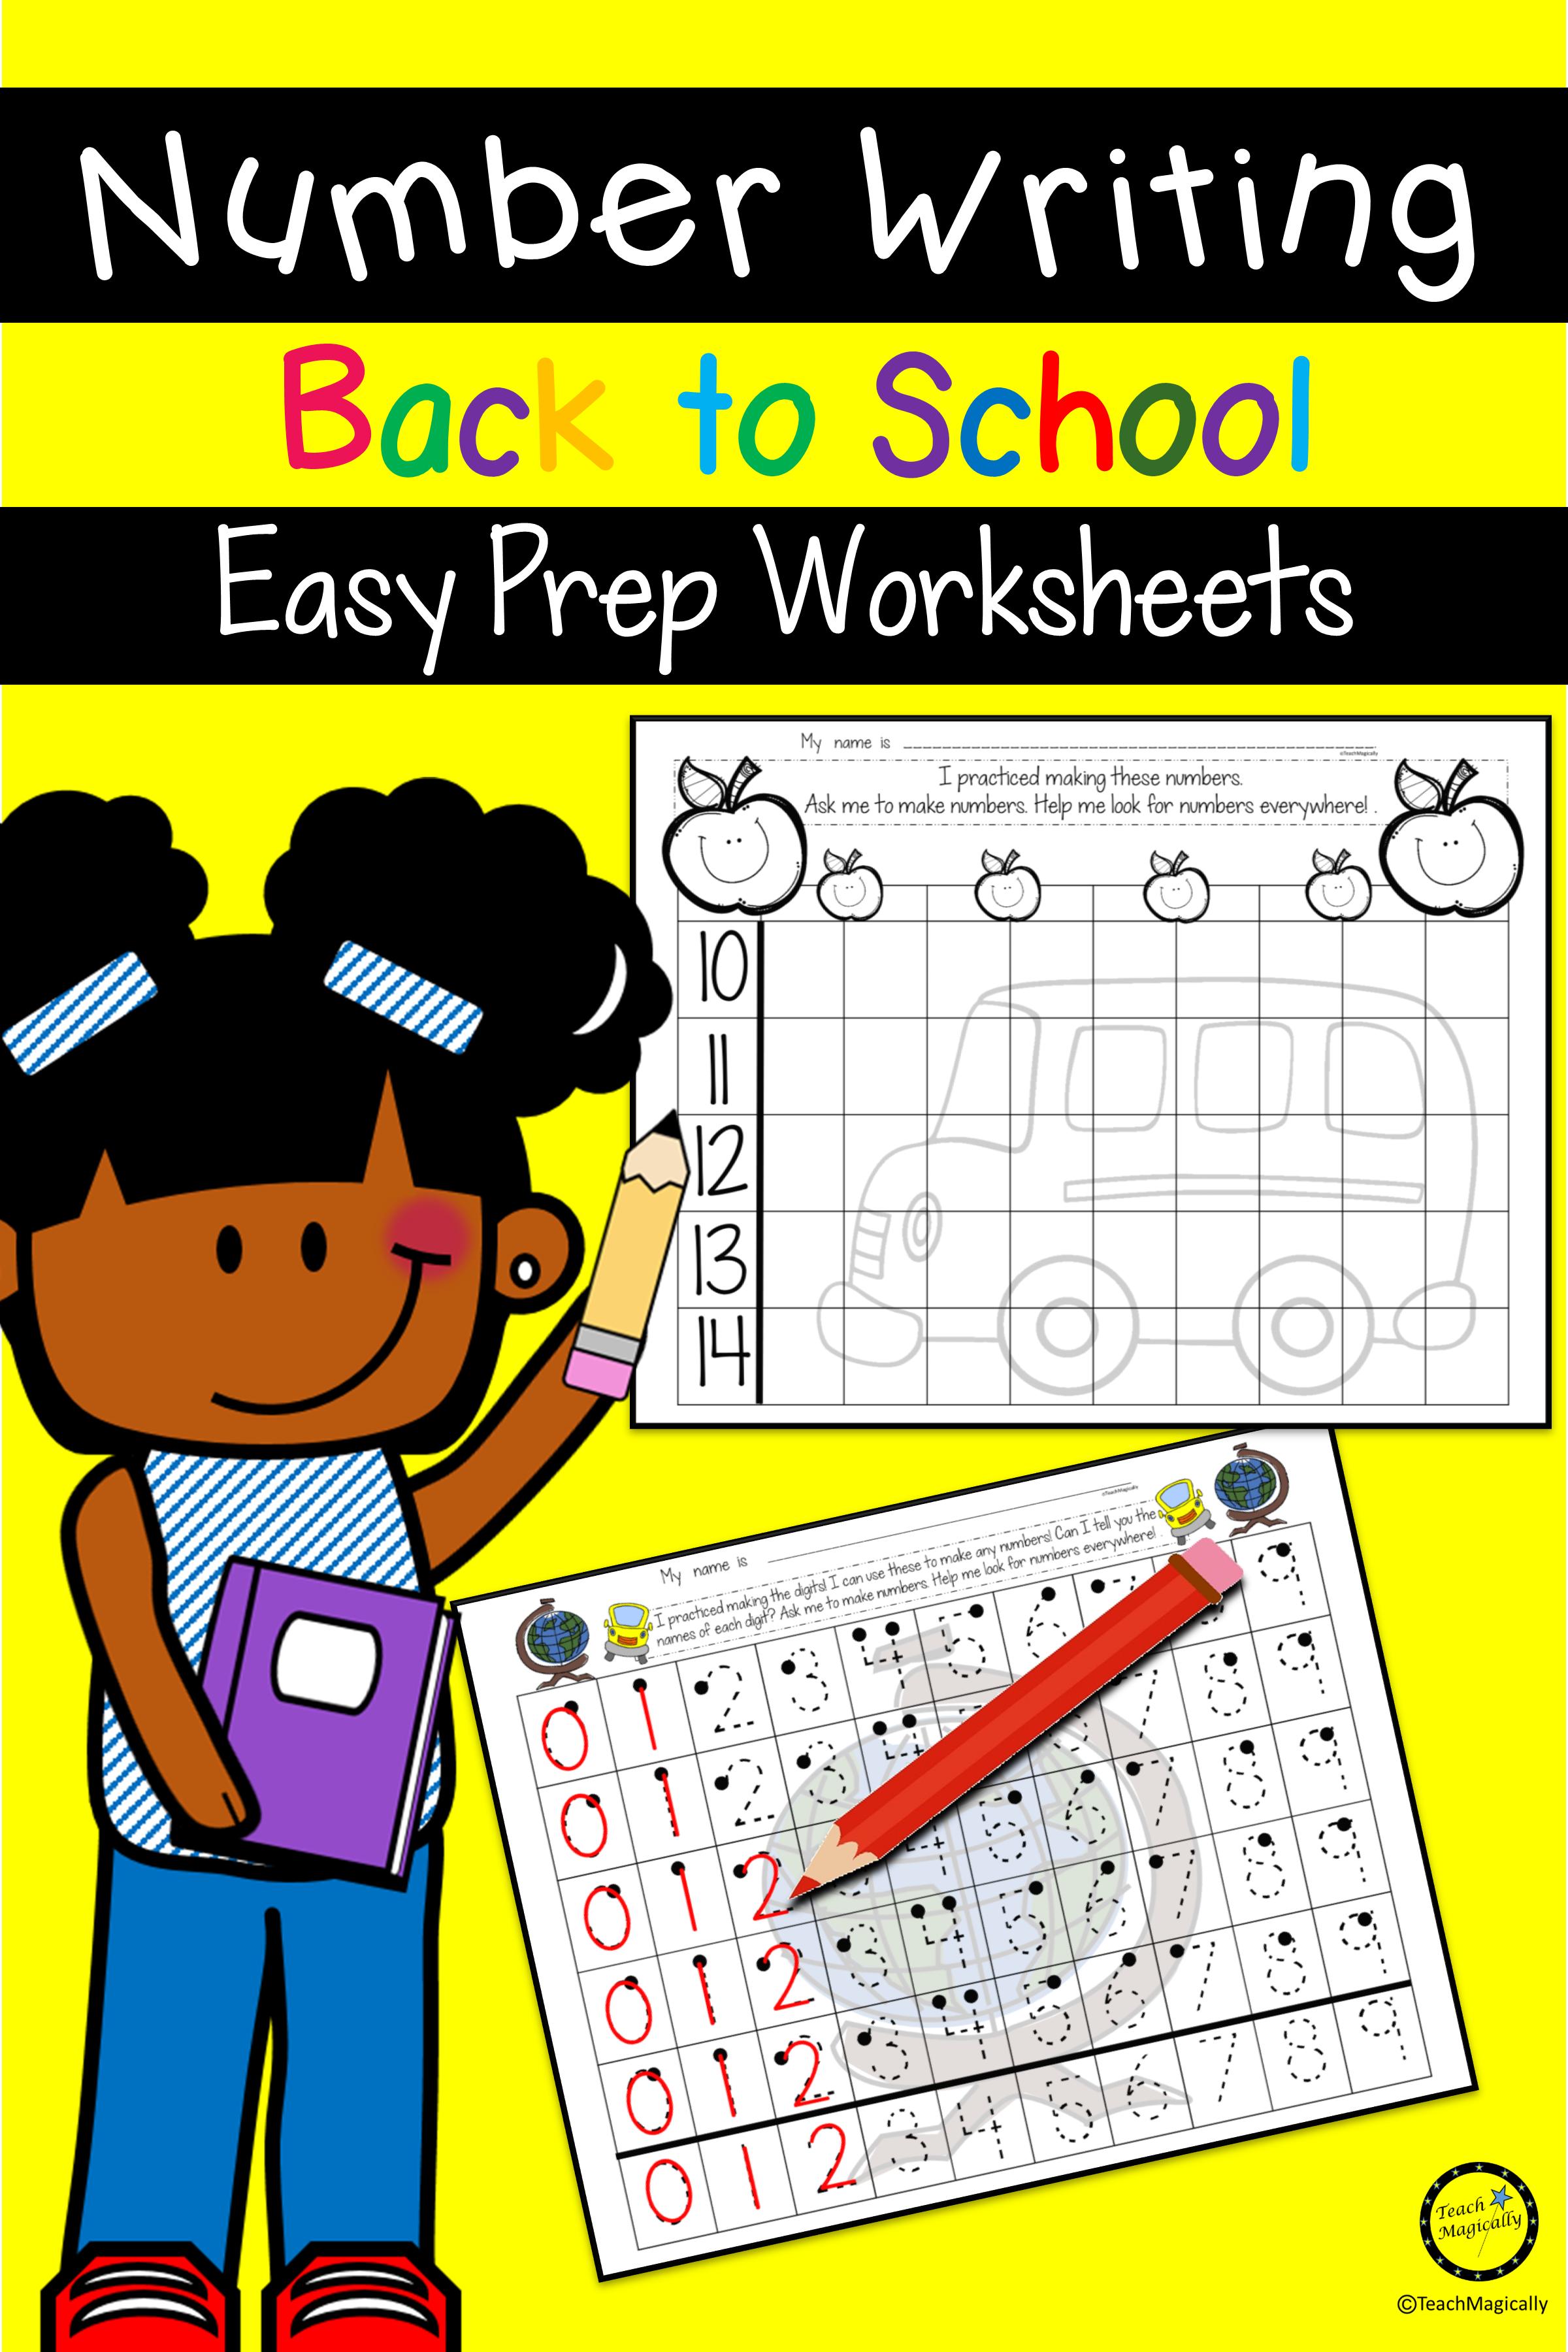 Back To School Math Number Writing Practice 1 20 Worksheets Writing Numbers Number Writing Practice Writing Practice [ 3600 x 2400 Pixel ]